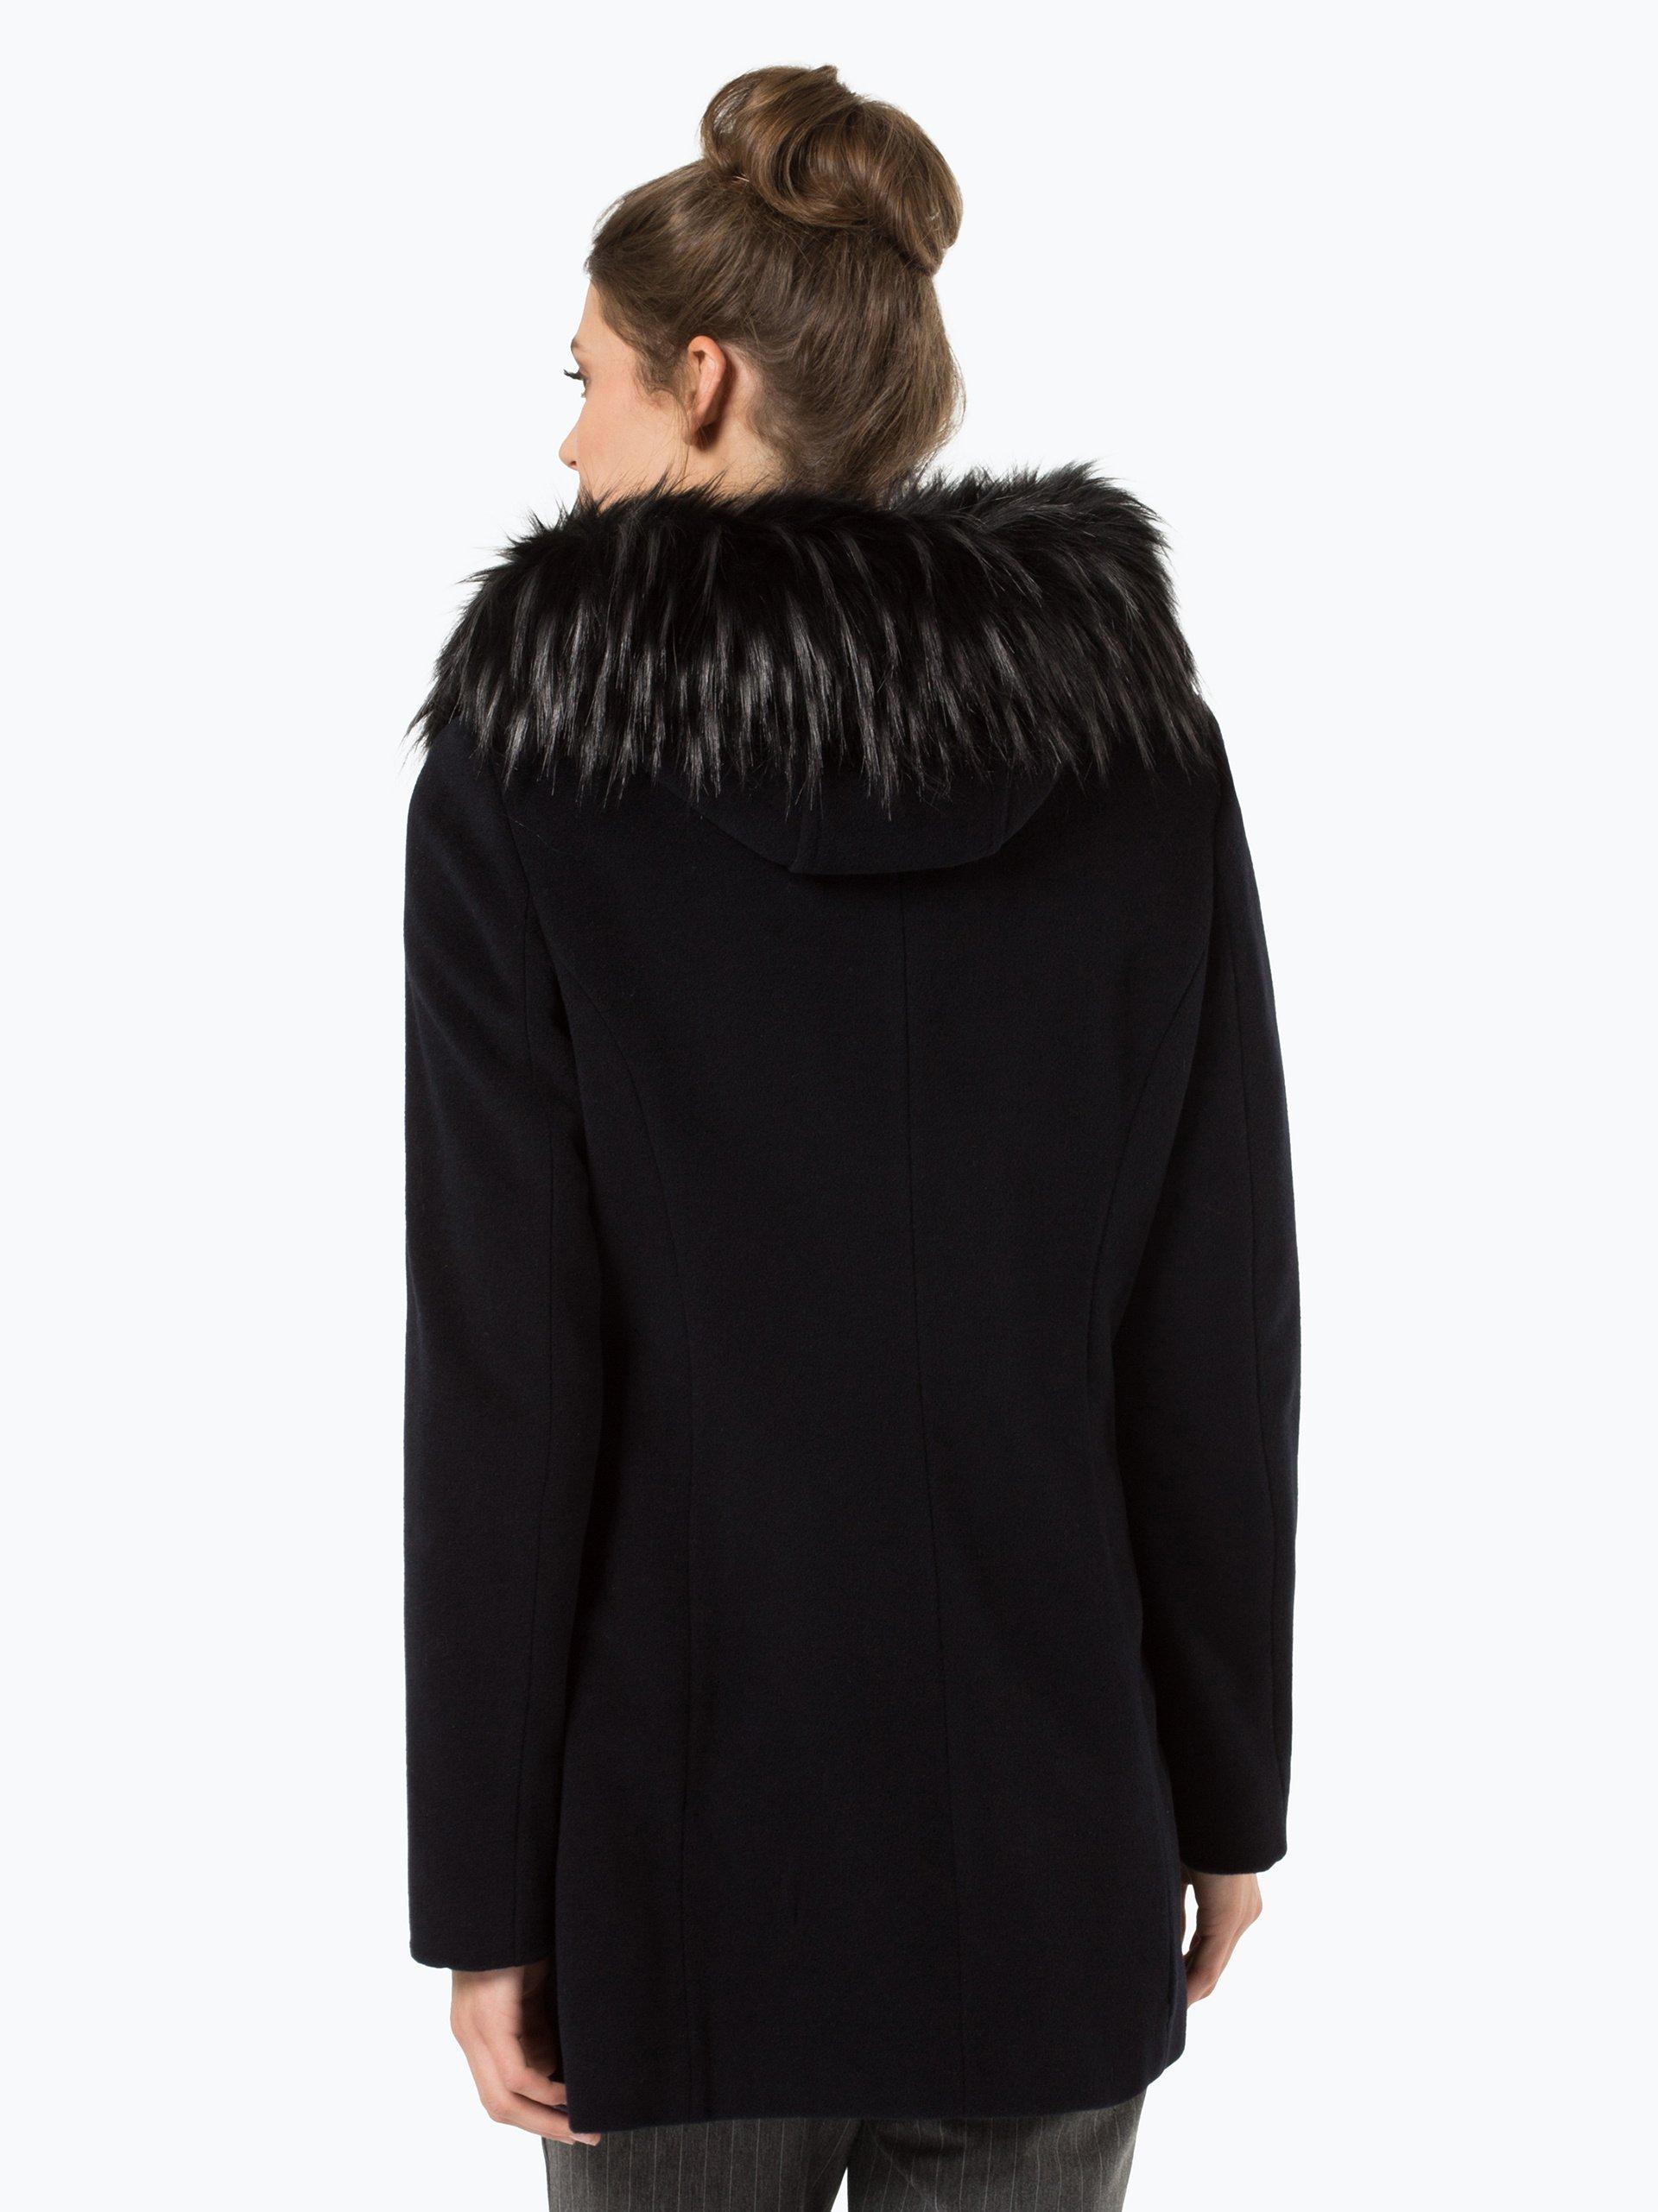 apriori damen mantel mit cashmere anteil marine uni online kaufen vangraaf com. Black Bedroom Furniture Sets. Home Design Ideas